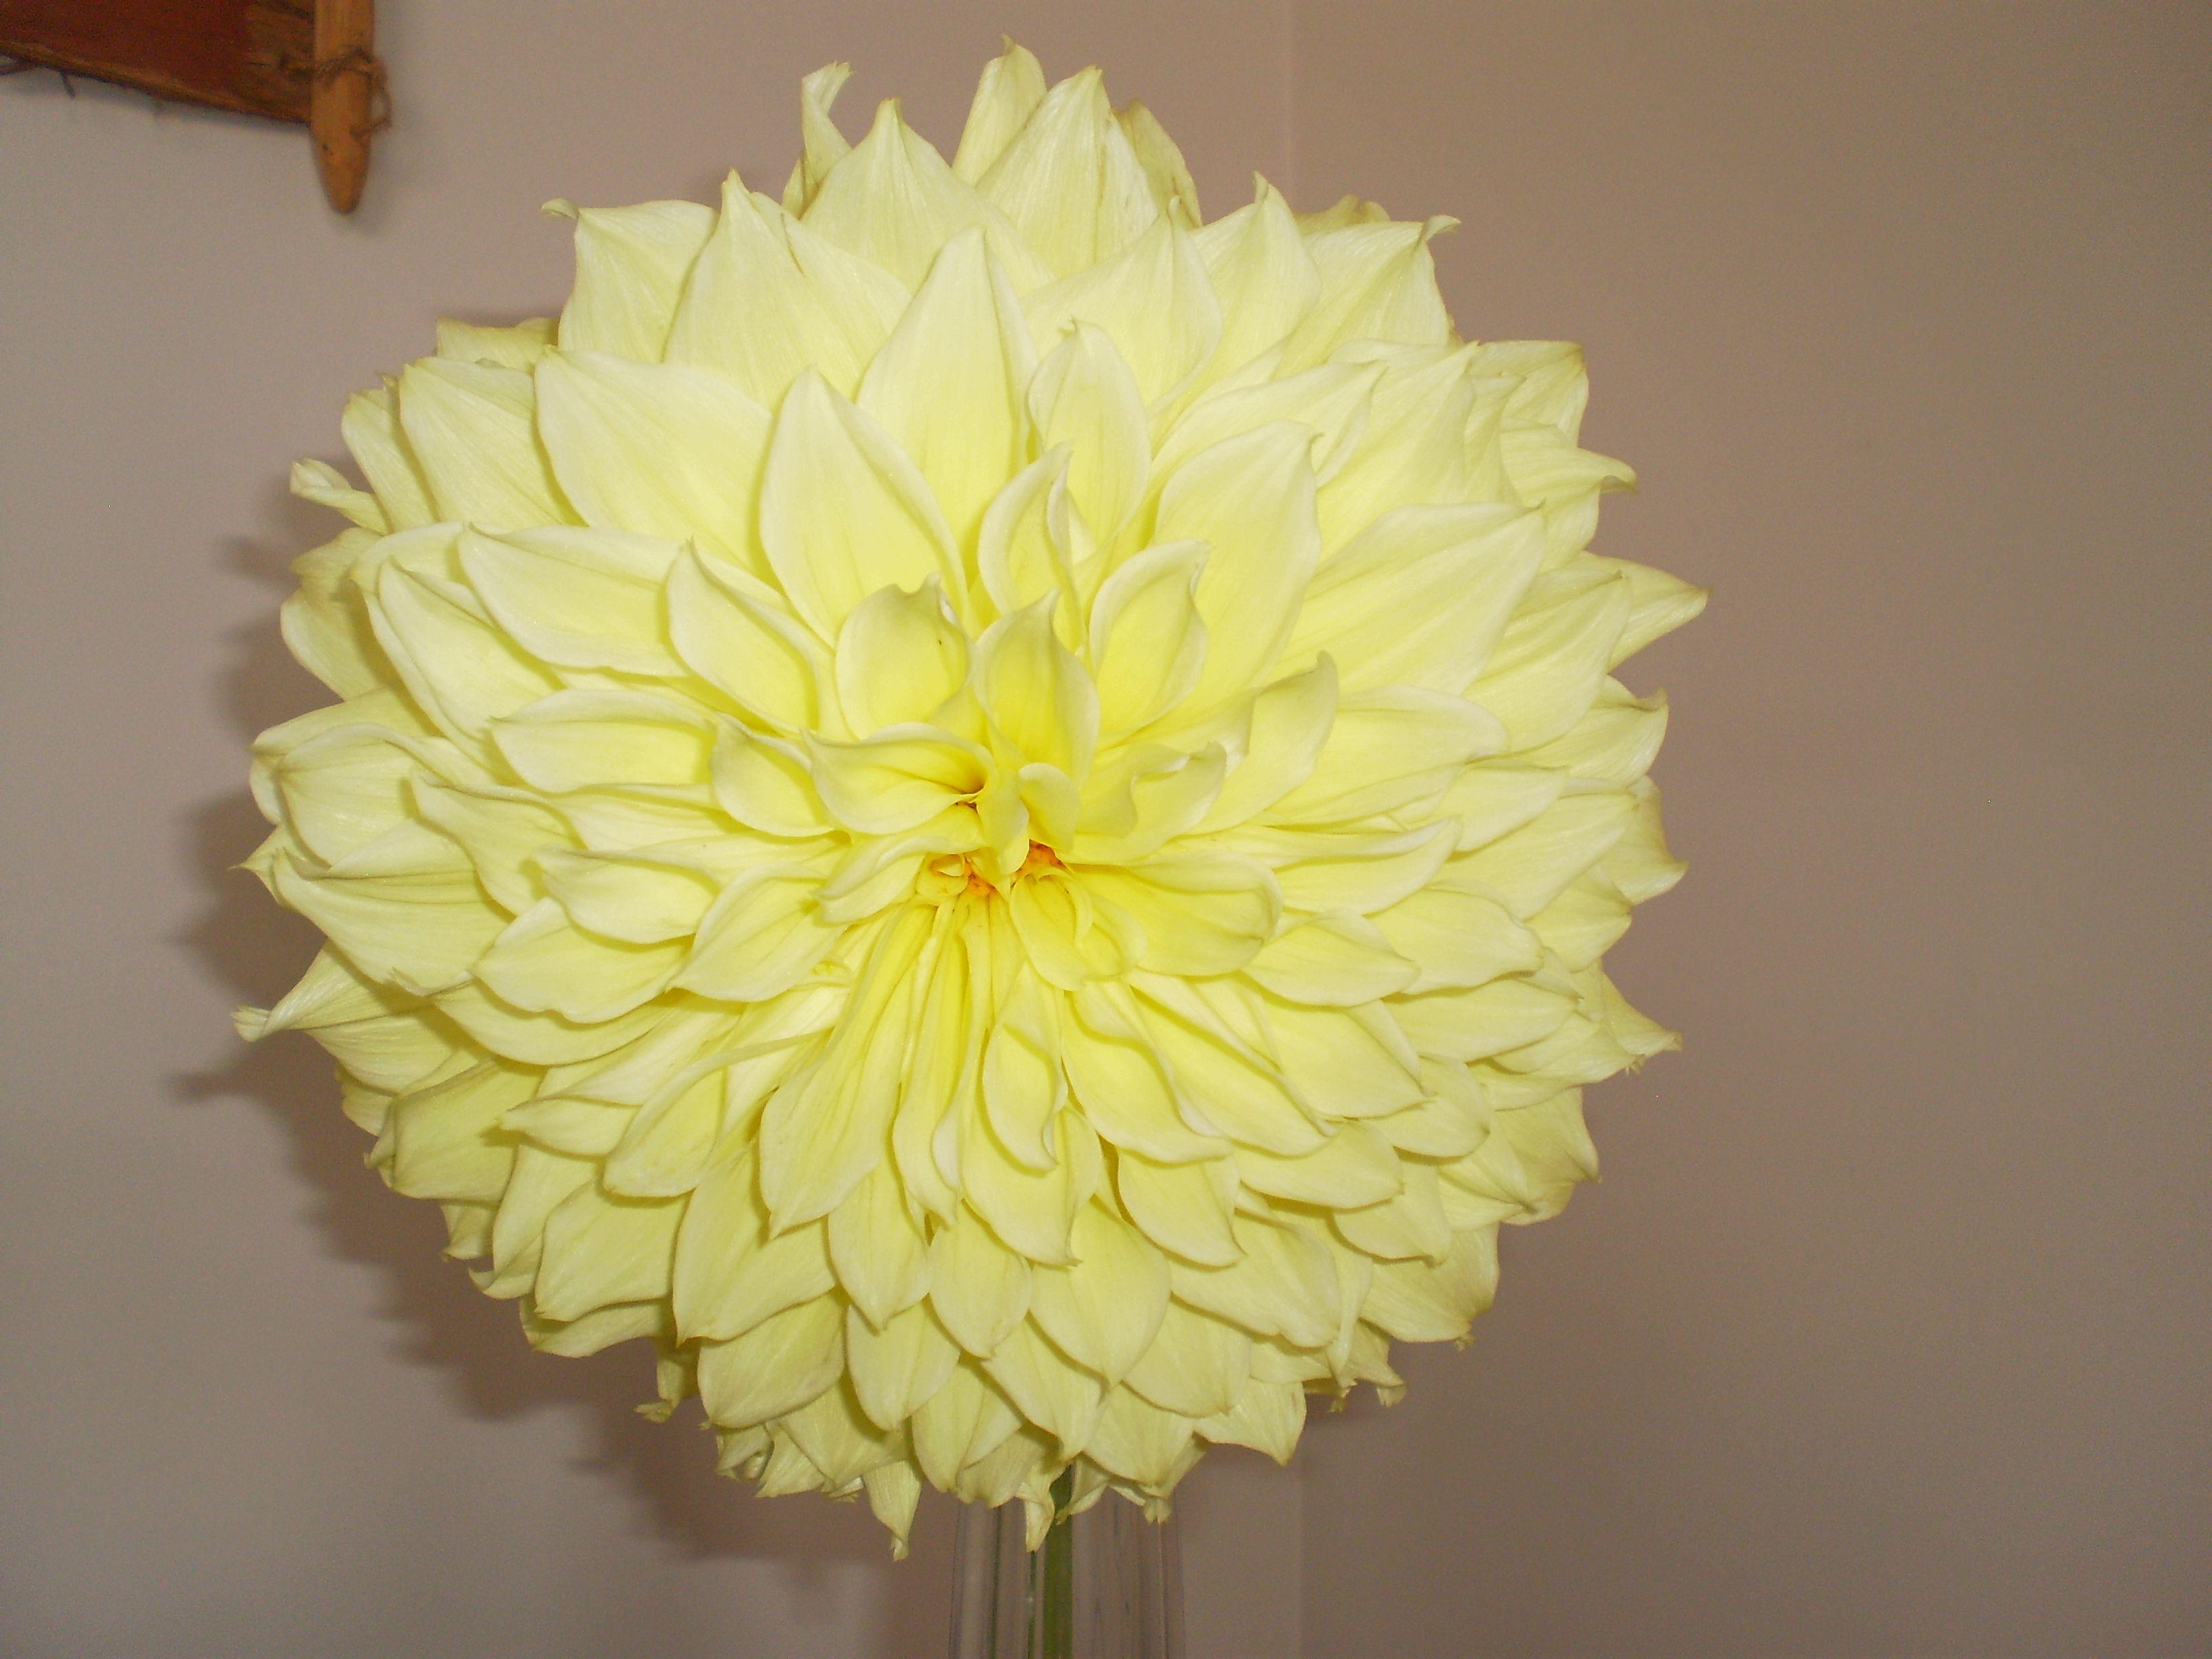 Dahlia Calvin Floodlight Novelty Lamp Paper Lamp Decor